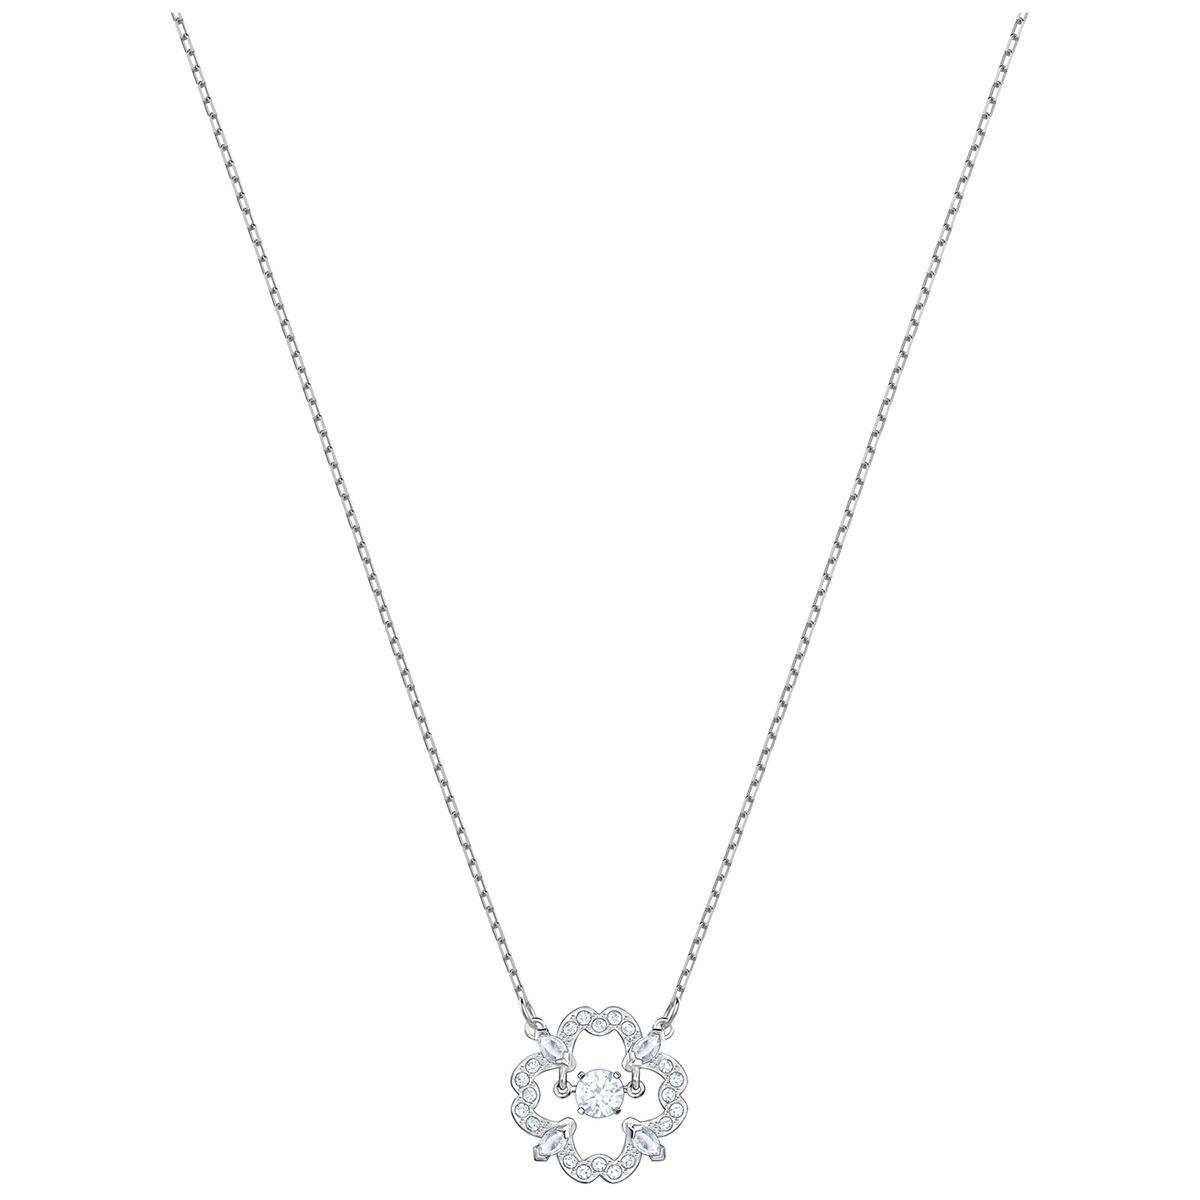 Swarovski Sparkling Dance Flower Crystal Rhodium Pendant Necklace